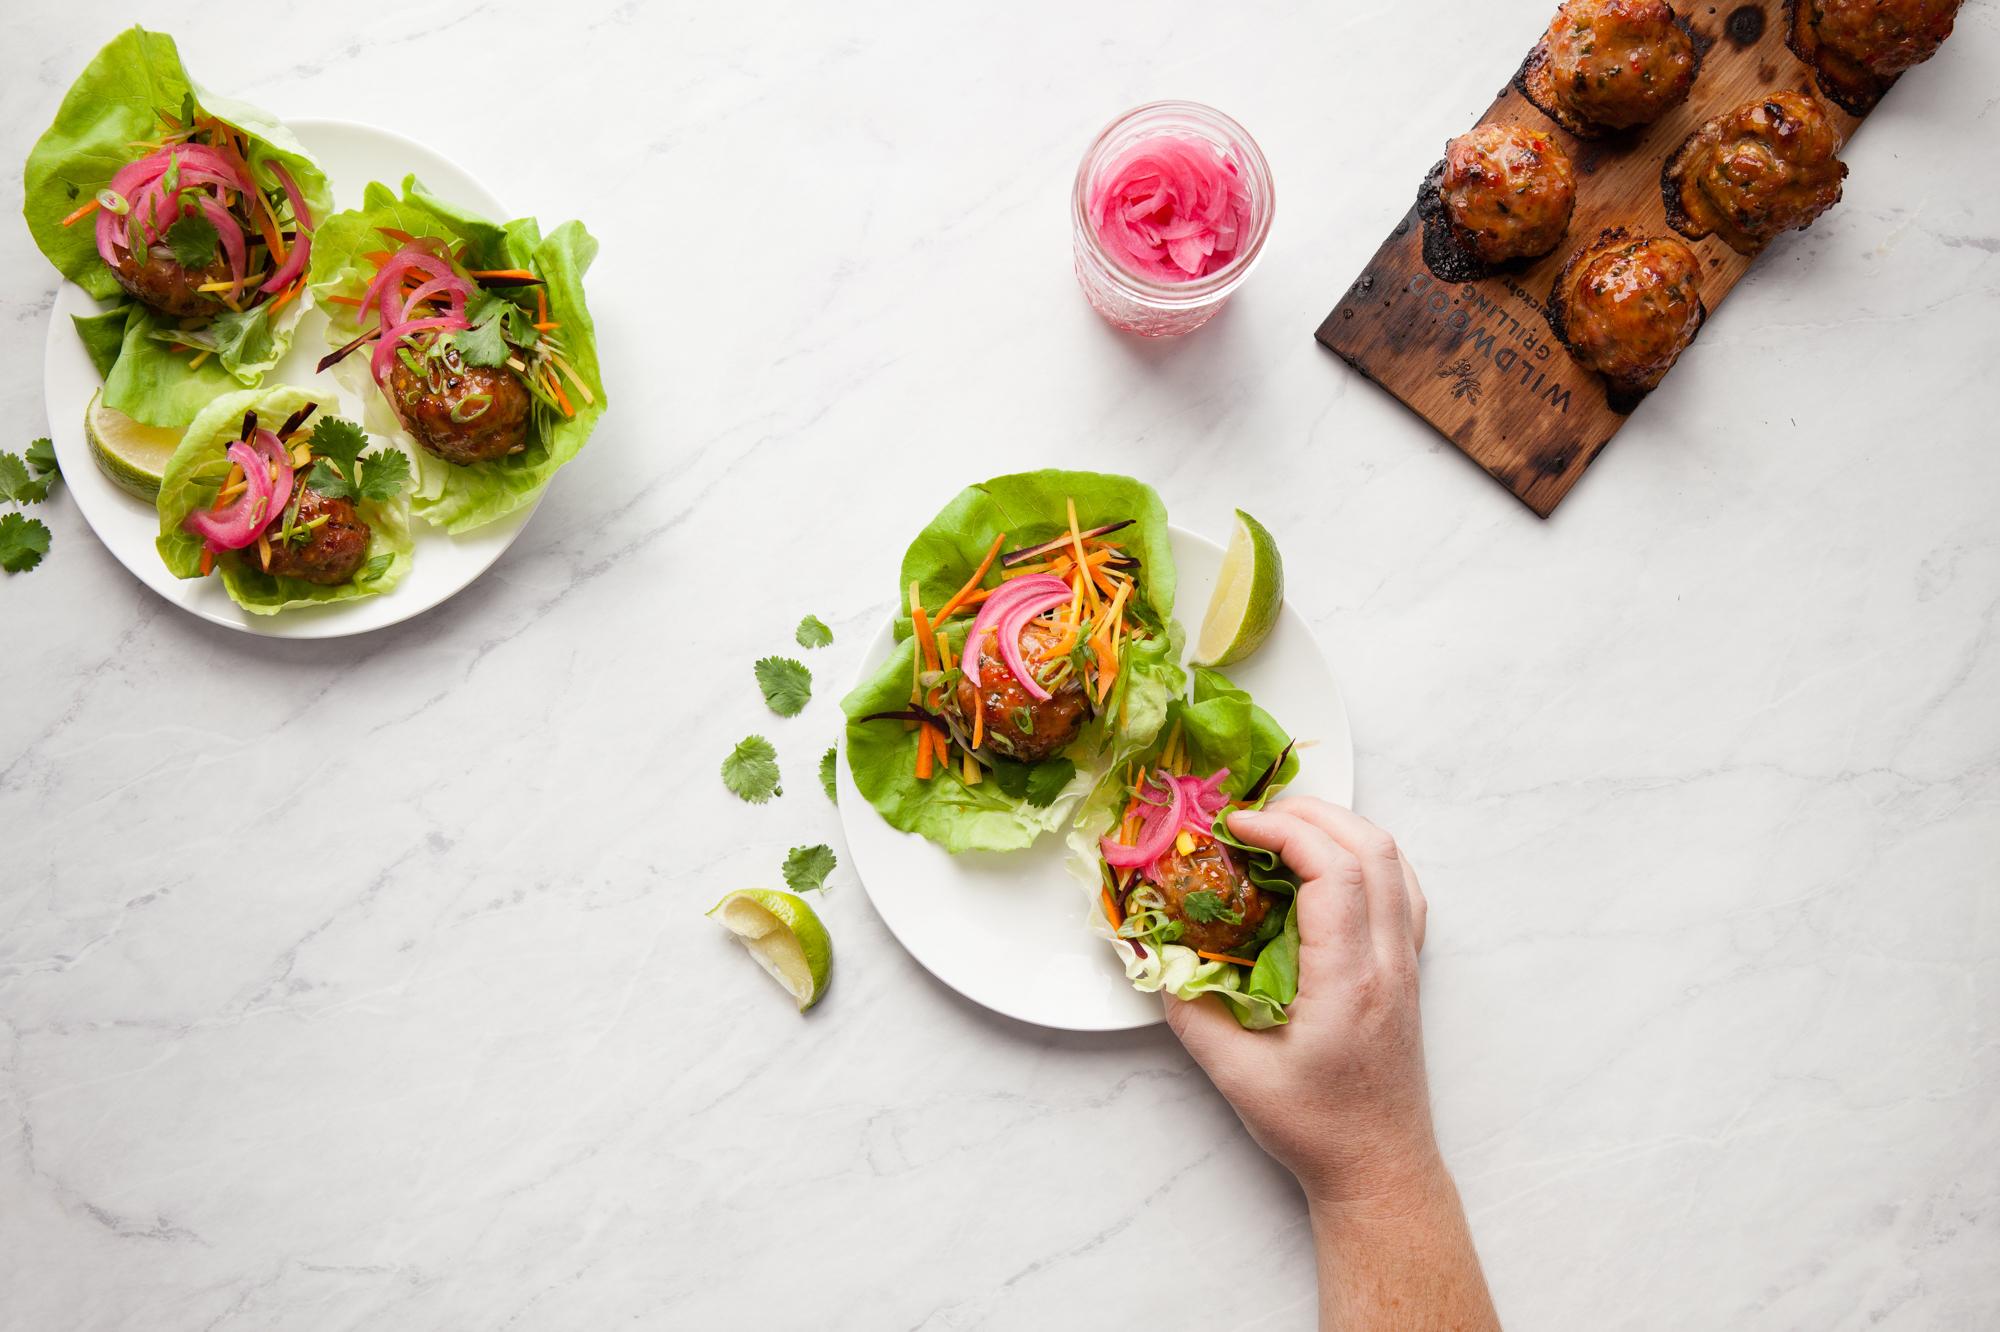 Grilling Dinner Idea: Thai Lettuce Cup